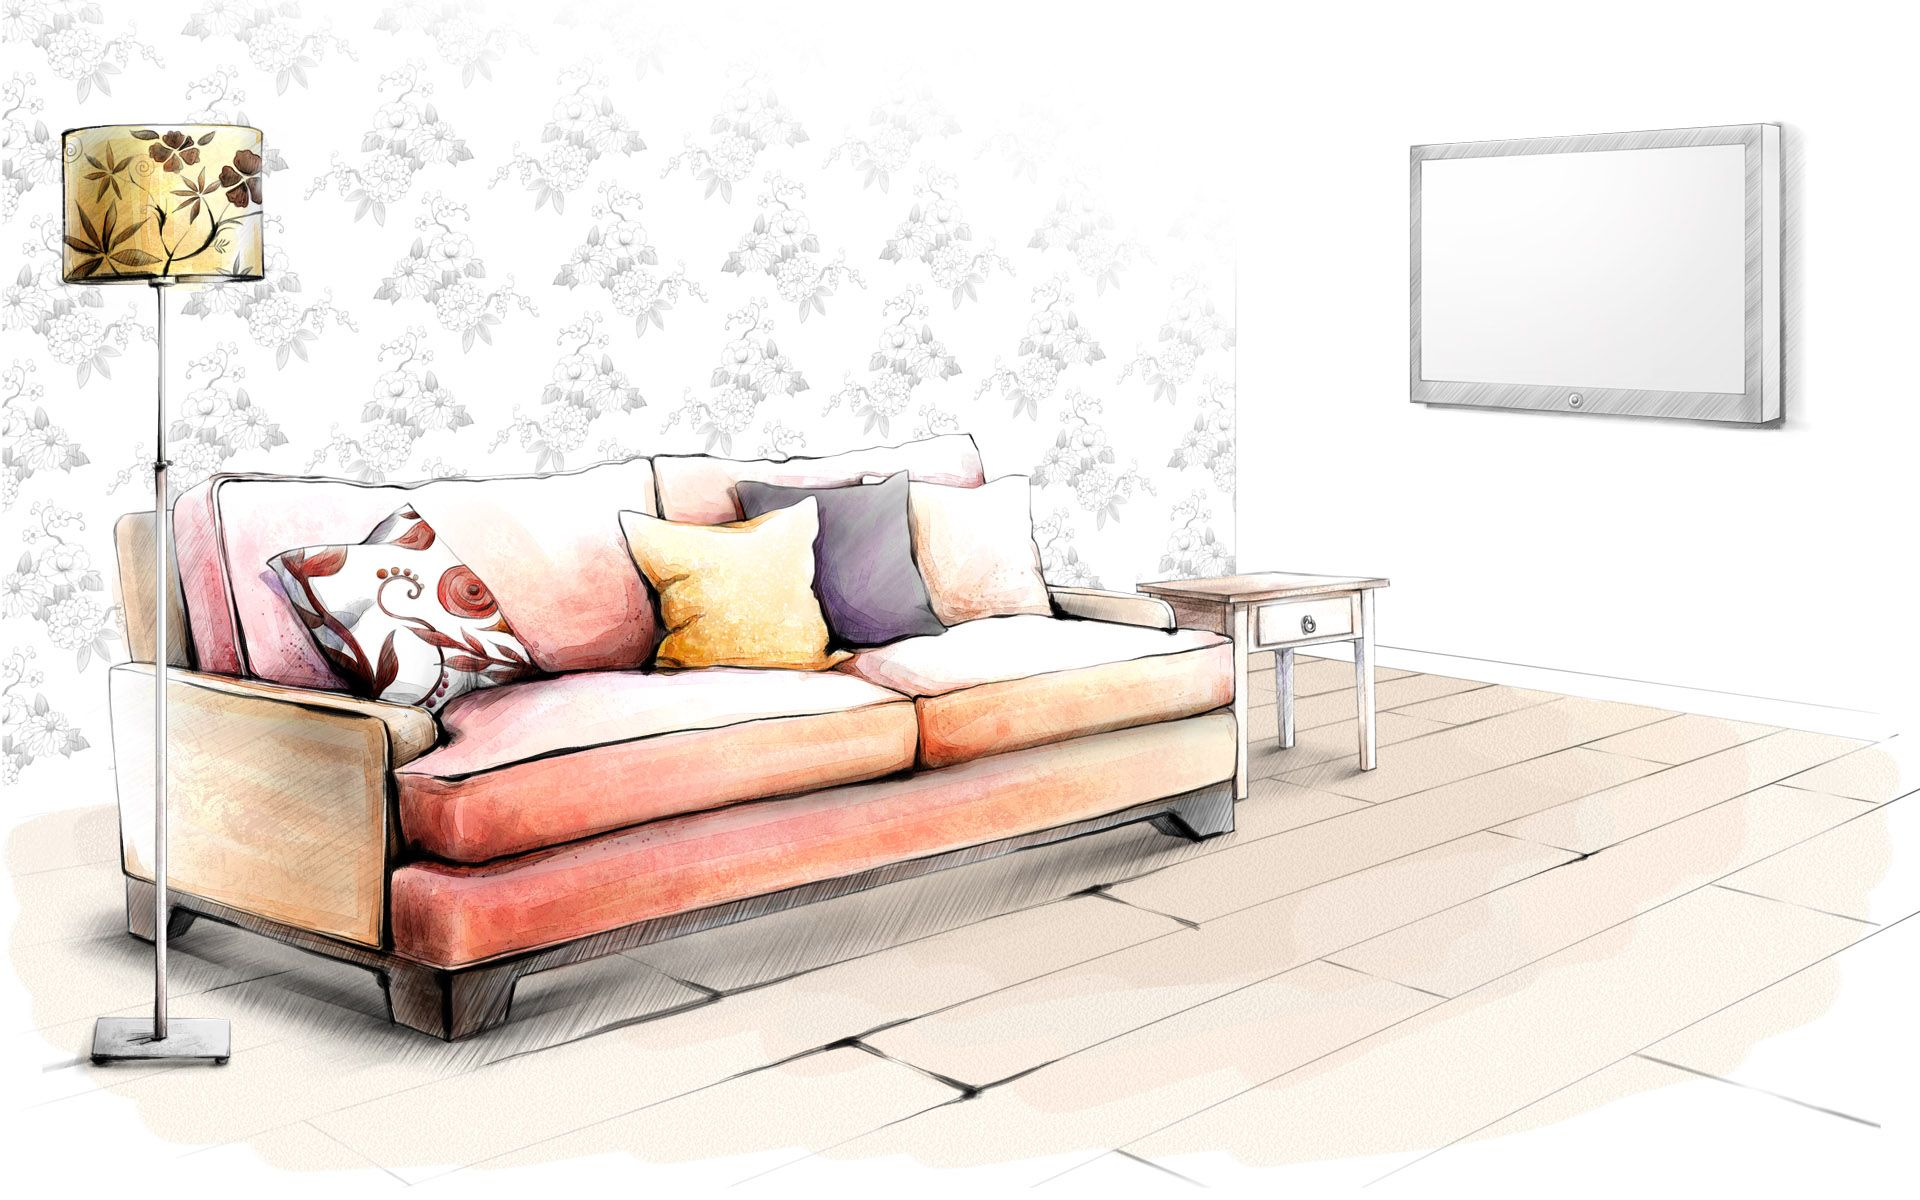 эскиз дивана фото